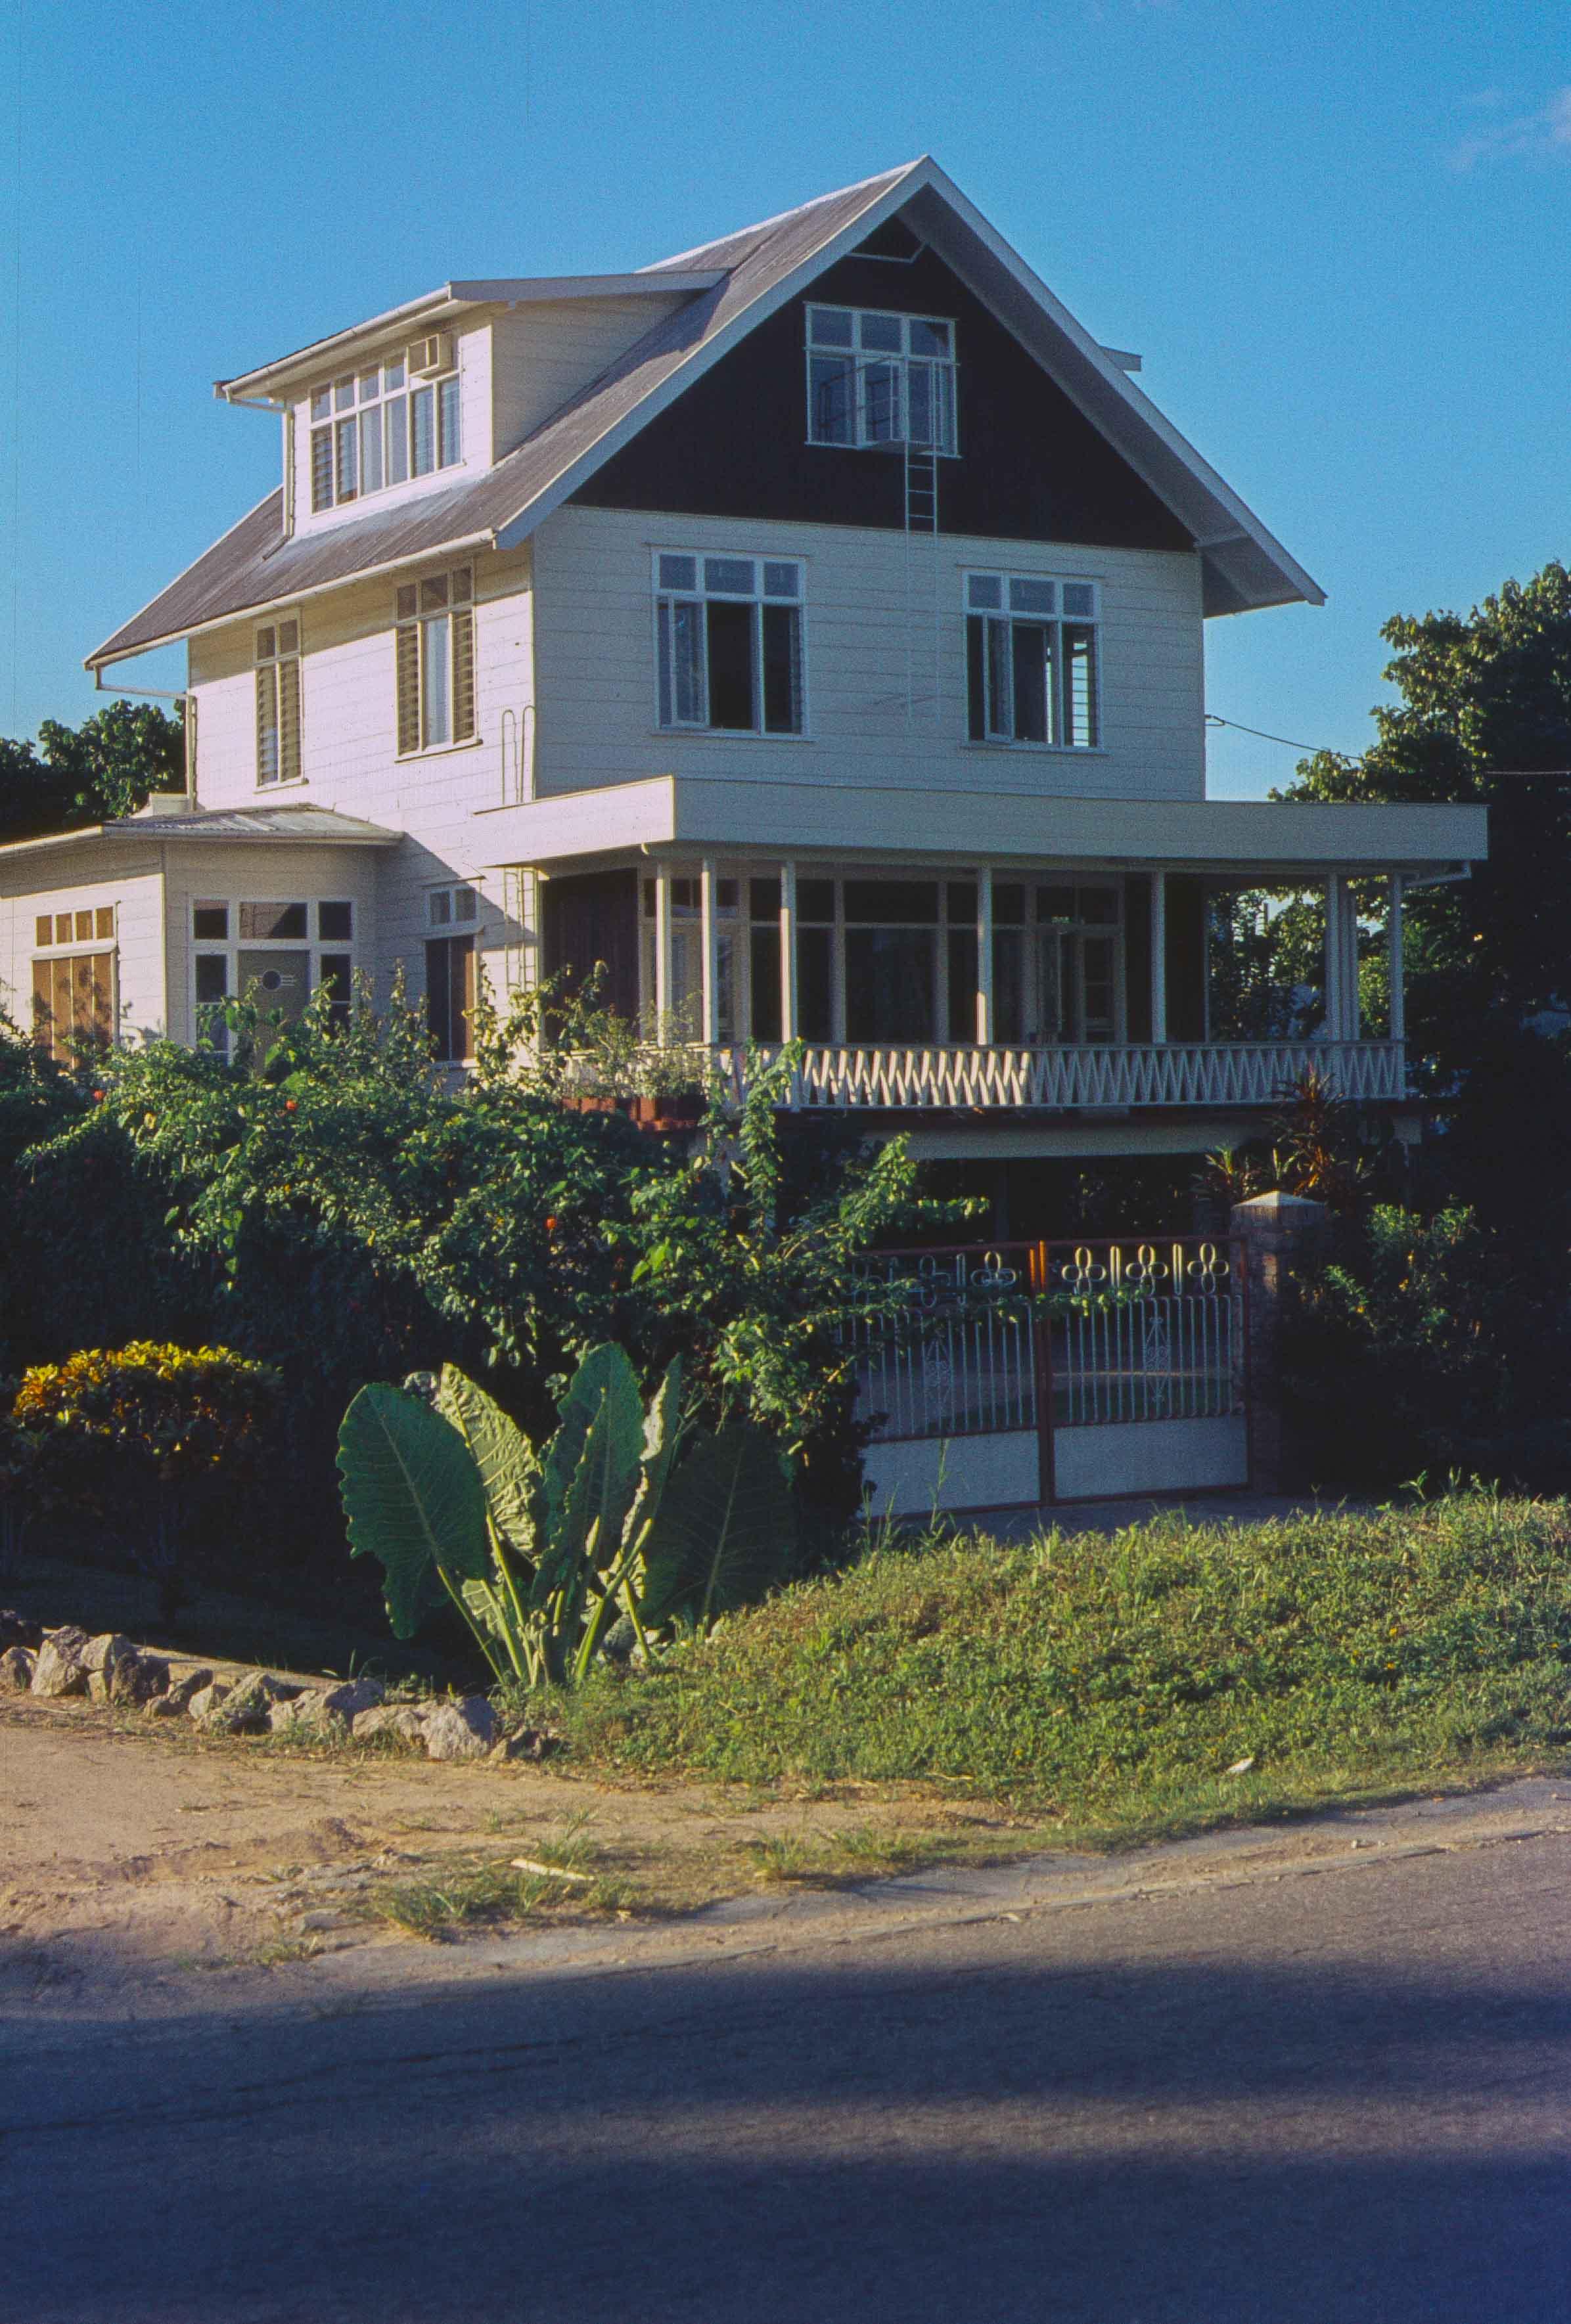 189. Suriname